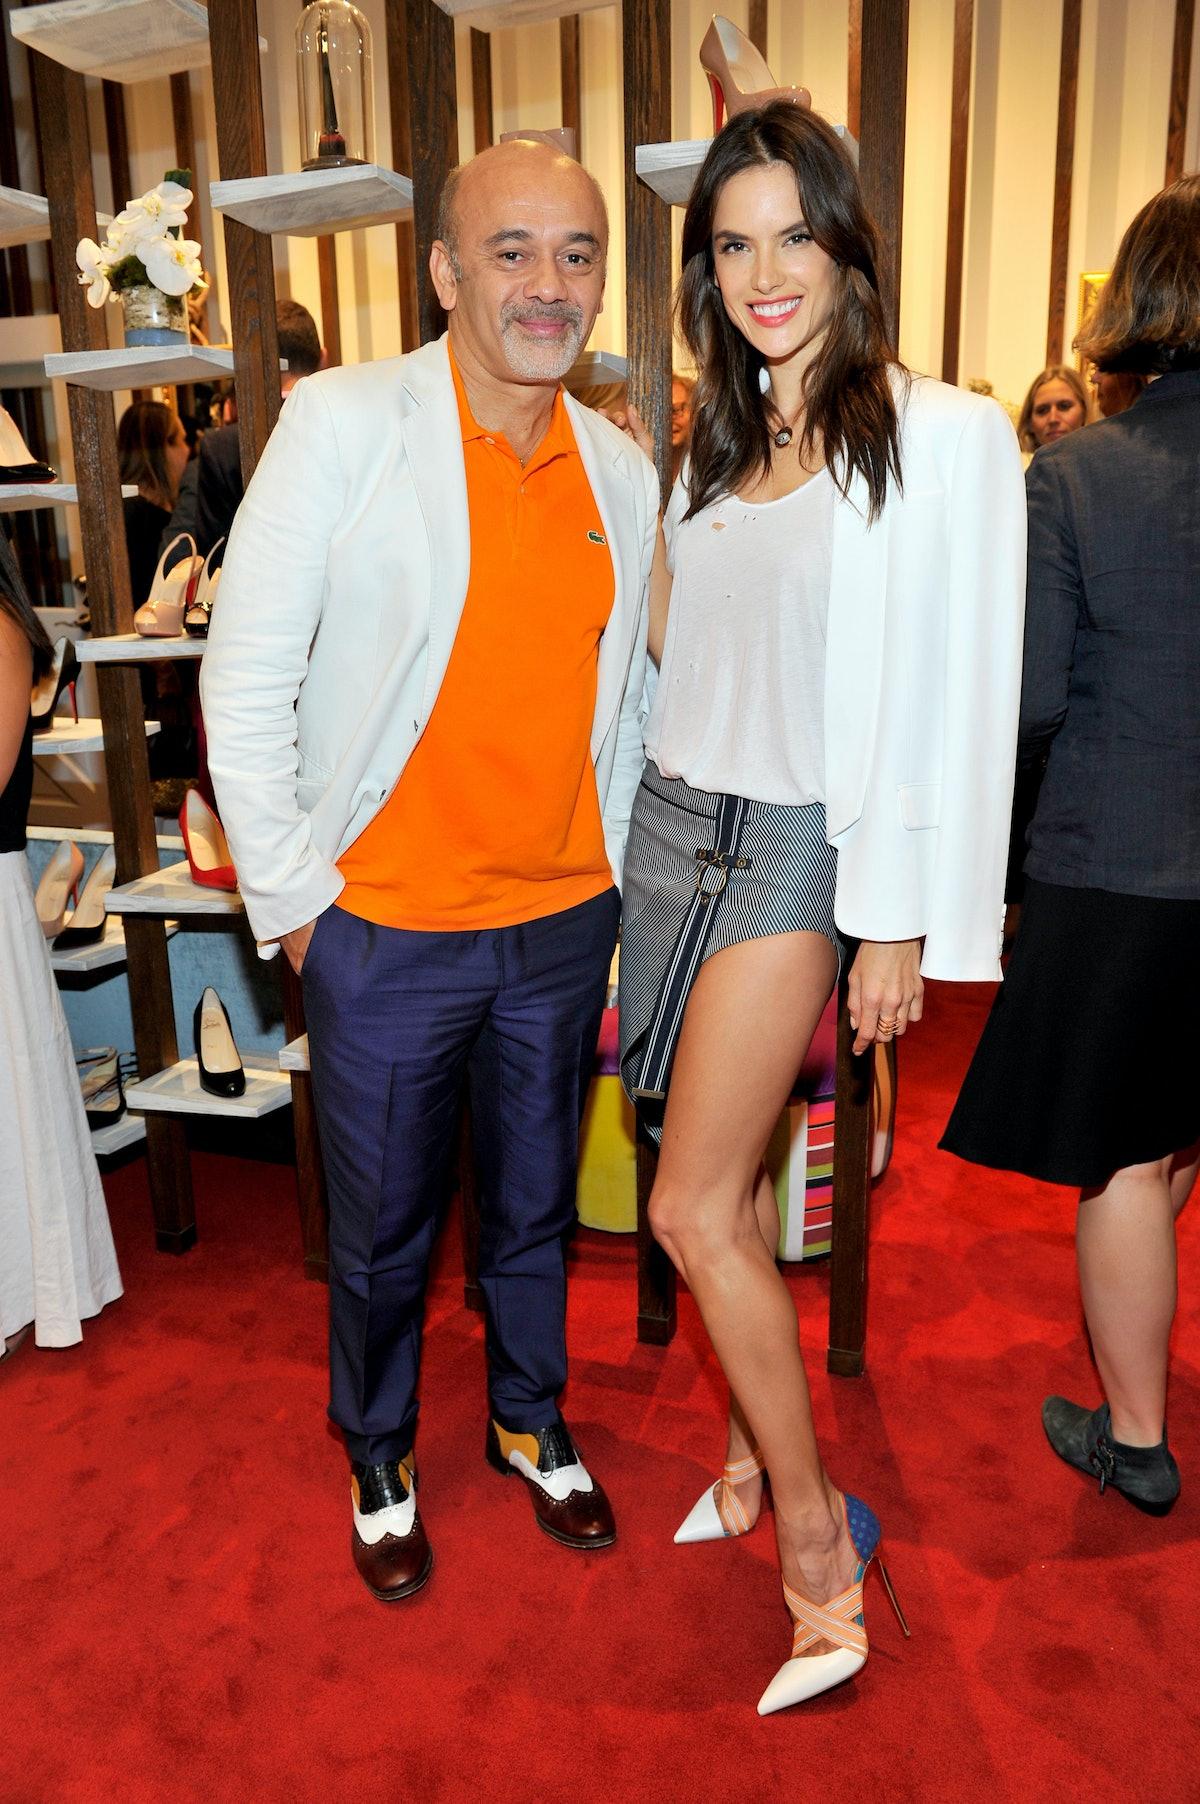 Christian Louboutin and Alessandra Ambrosio